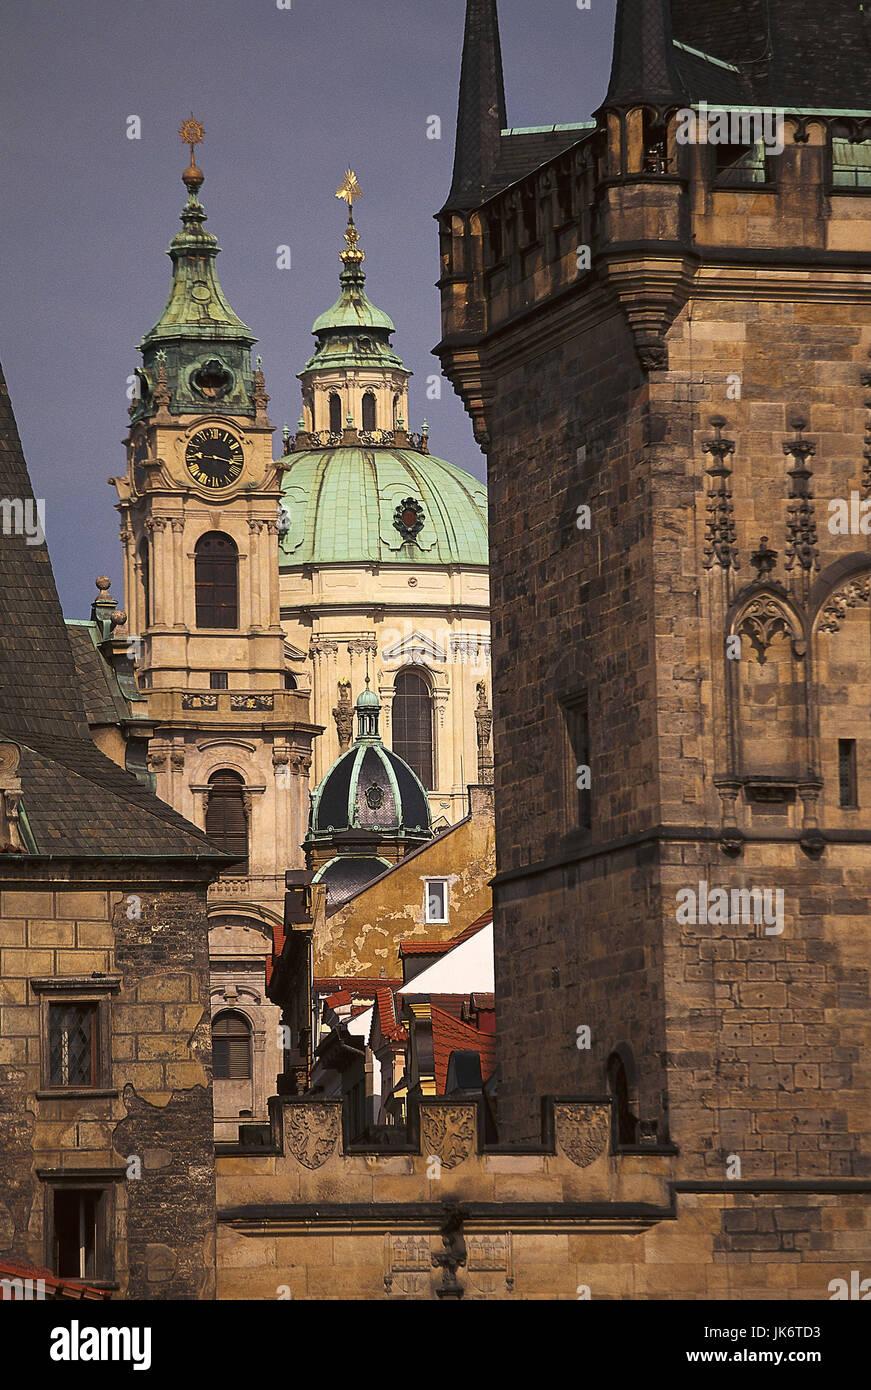 Tschechische Republik, Mittelböhmen,  Praha, Kleinseite, Kirche St. Niklas,  Brückenturm, Detail Europa, Osteuropa, Stock Photo